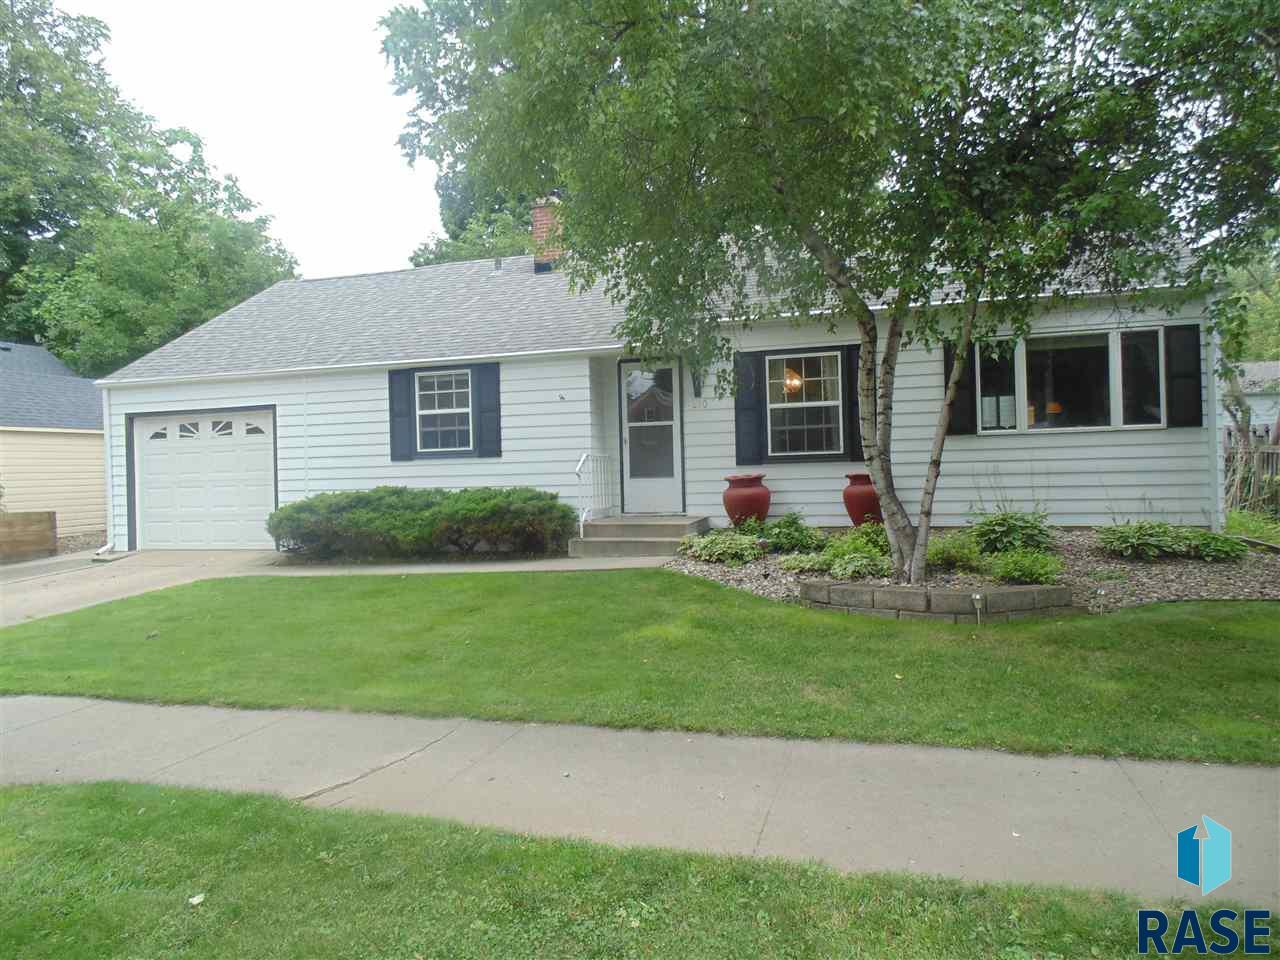 210 W 31st St, Sioux Falls, SD 57105